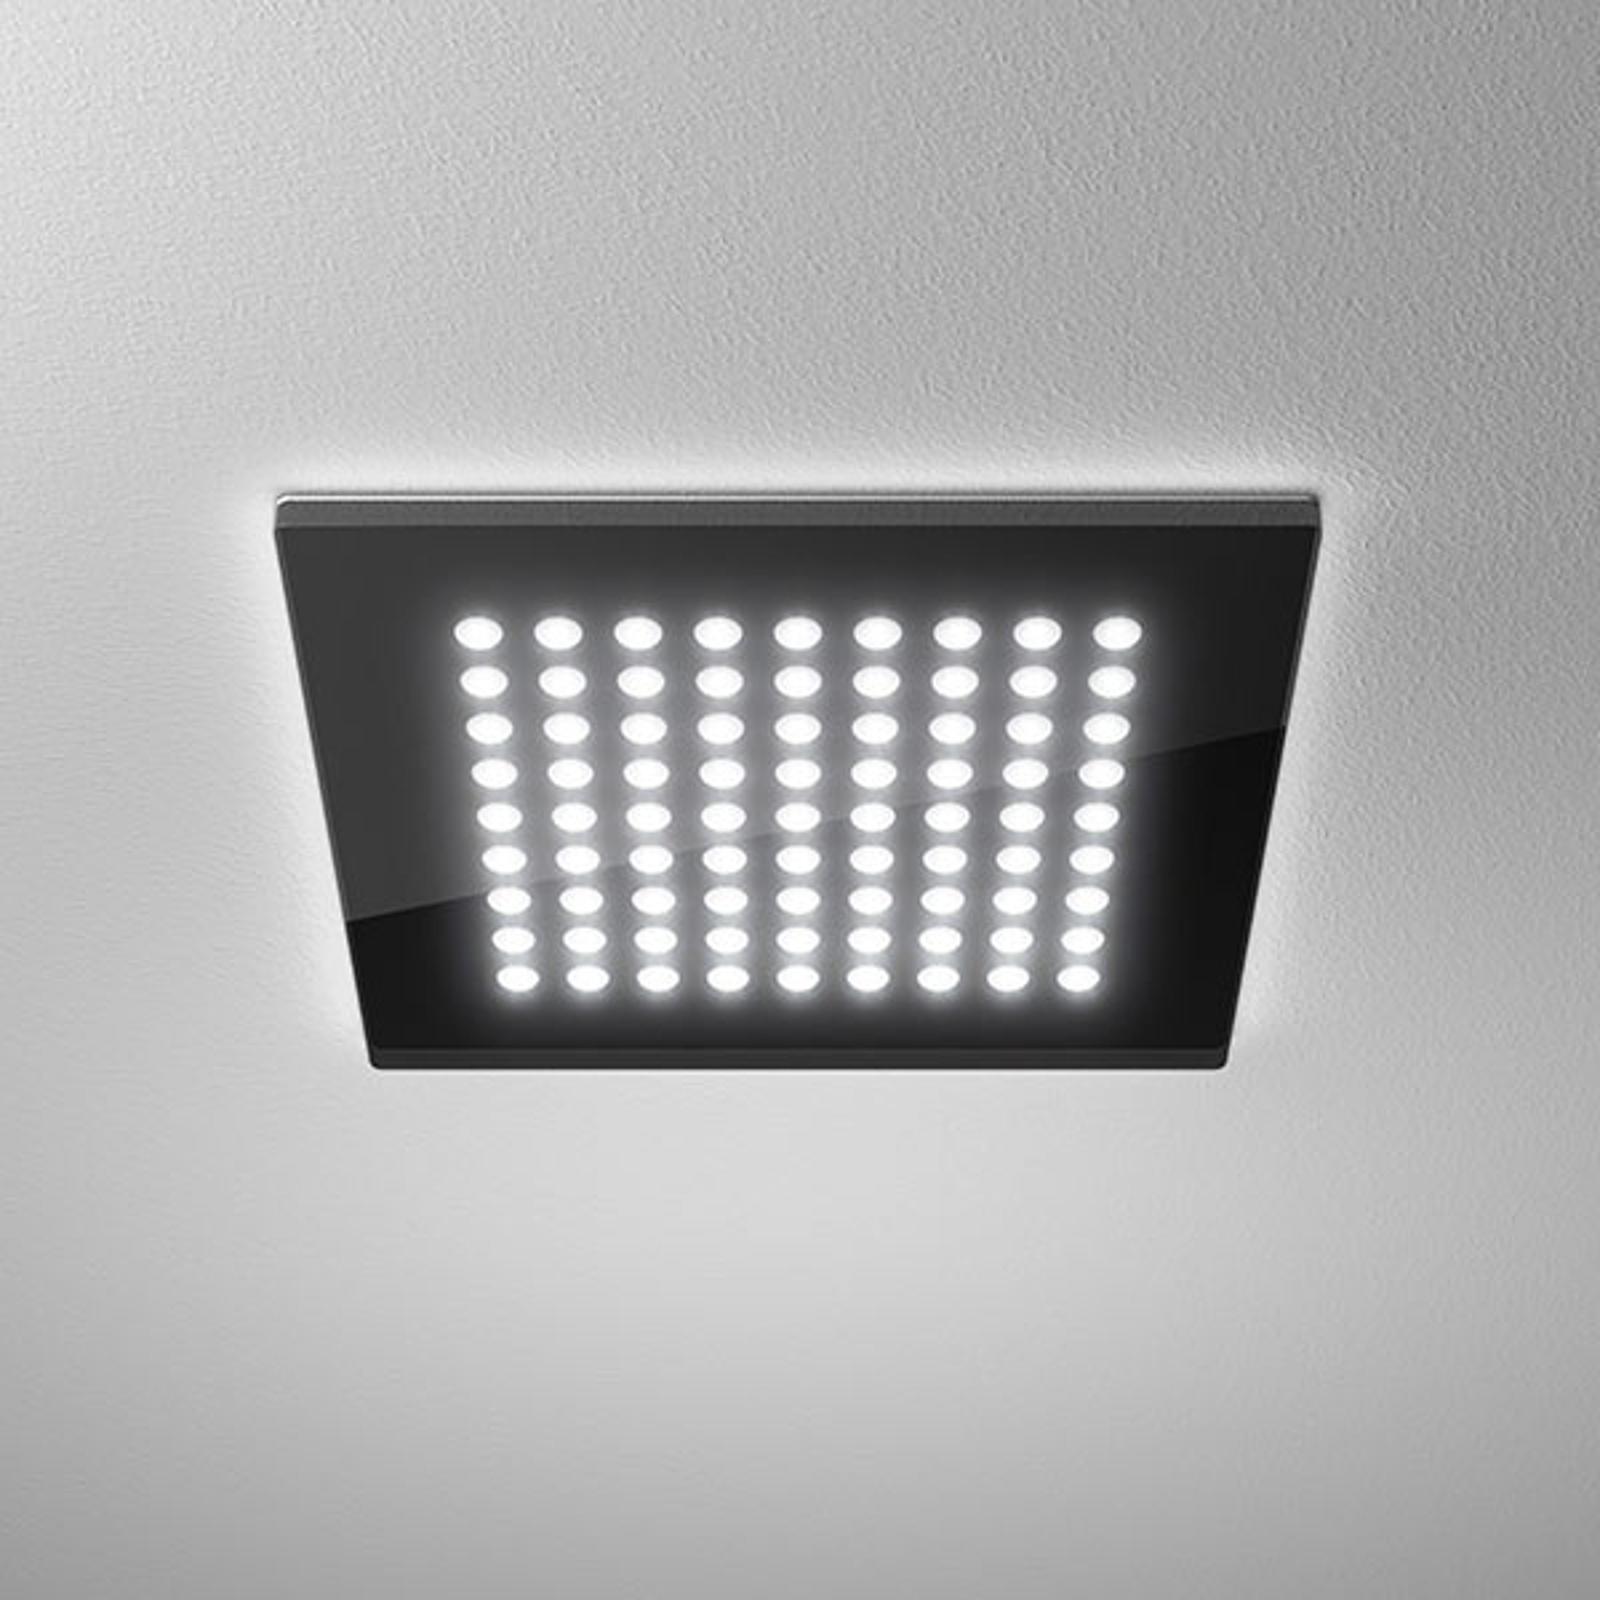 LED downlight Domino Flat Square, 21 x 21 cm, 18 W